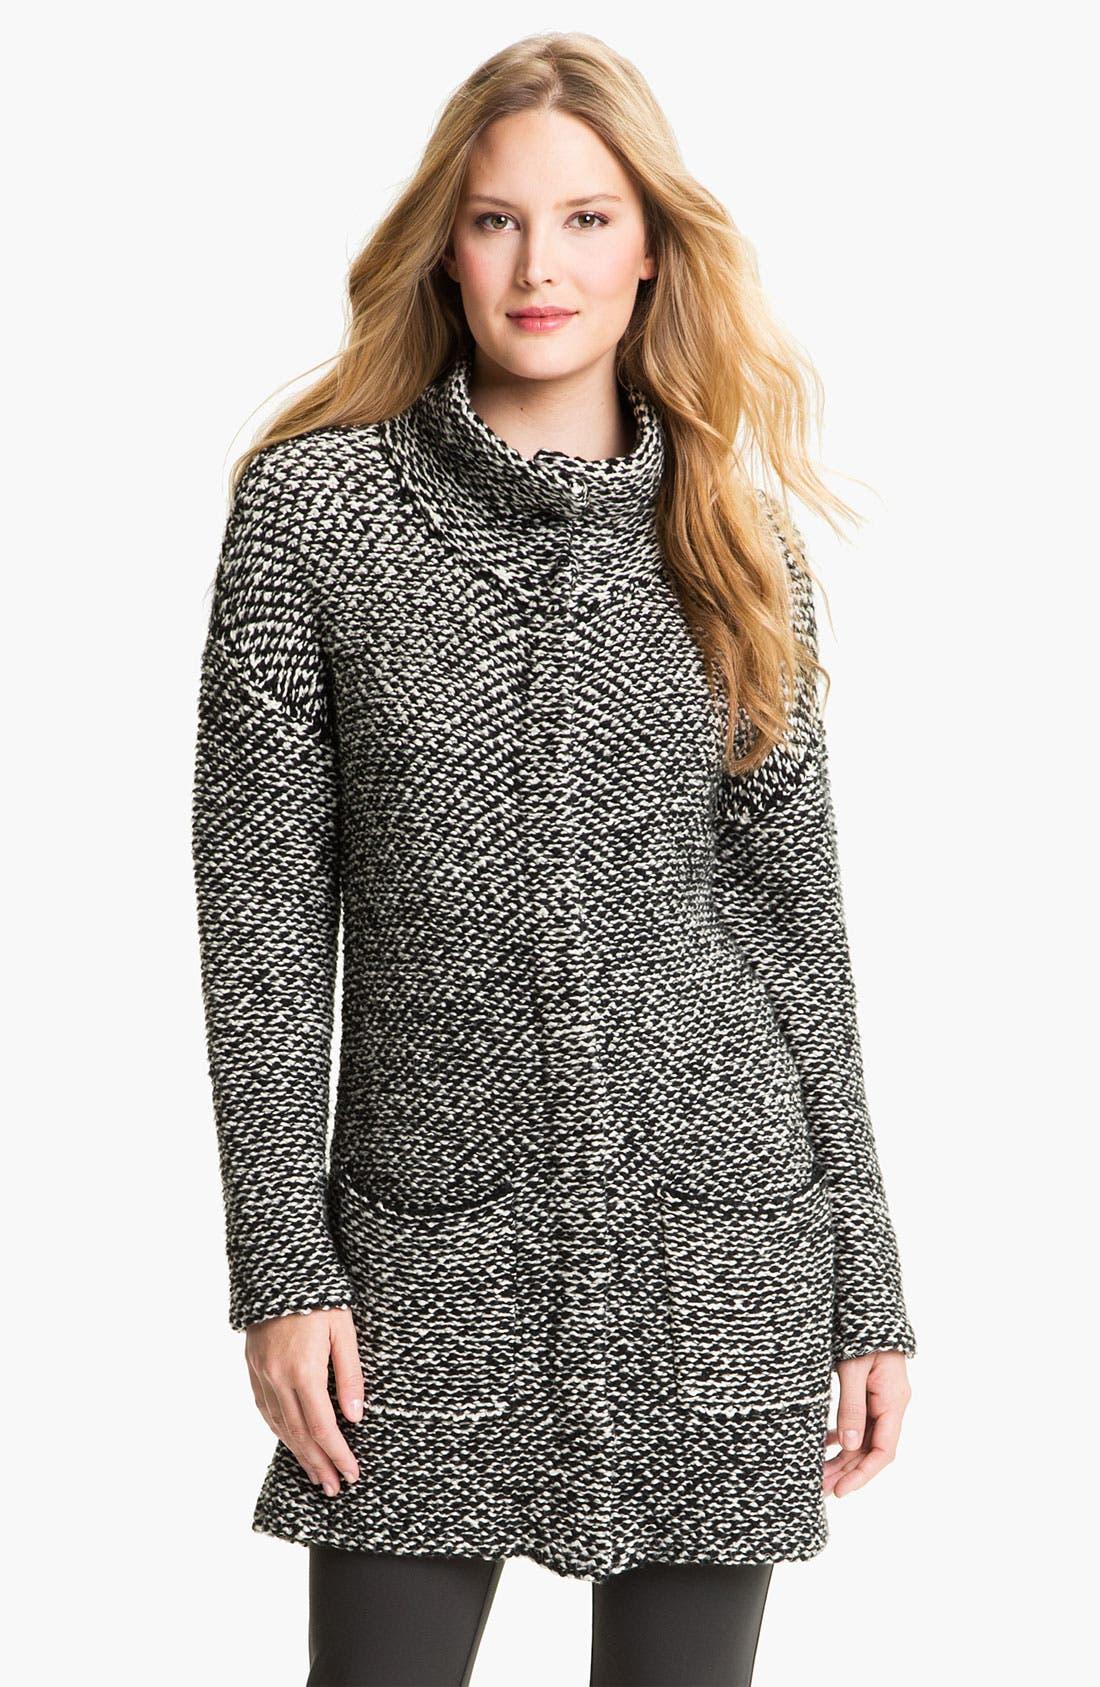 Alternate Image 1 Selected - Eileen Fisher Funnel Collar Twist Jacket (Petite)